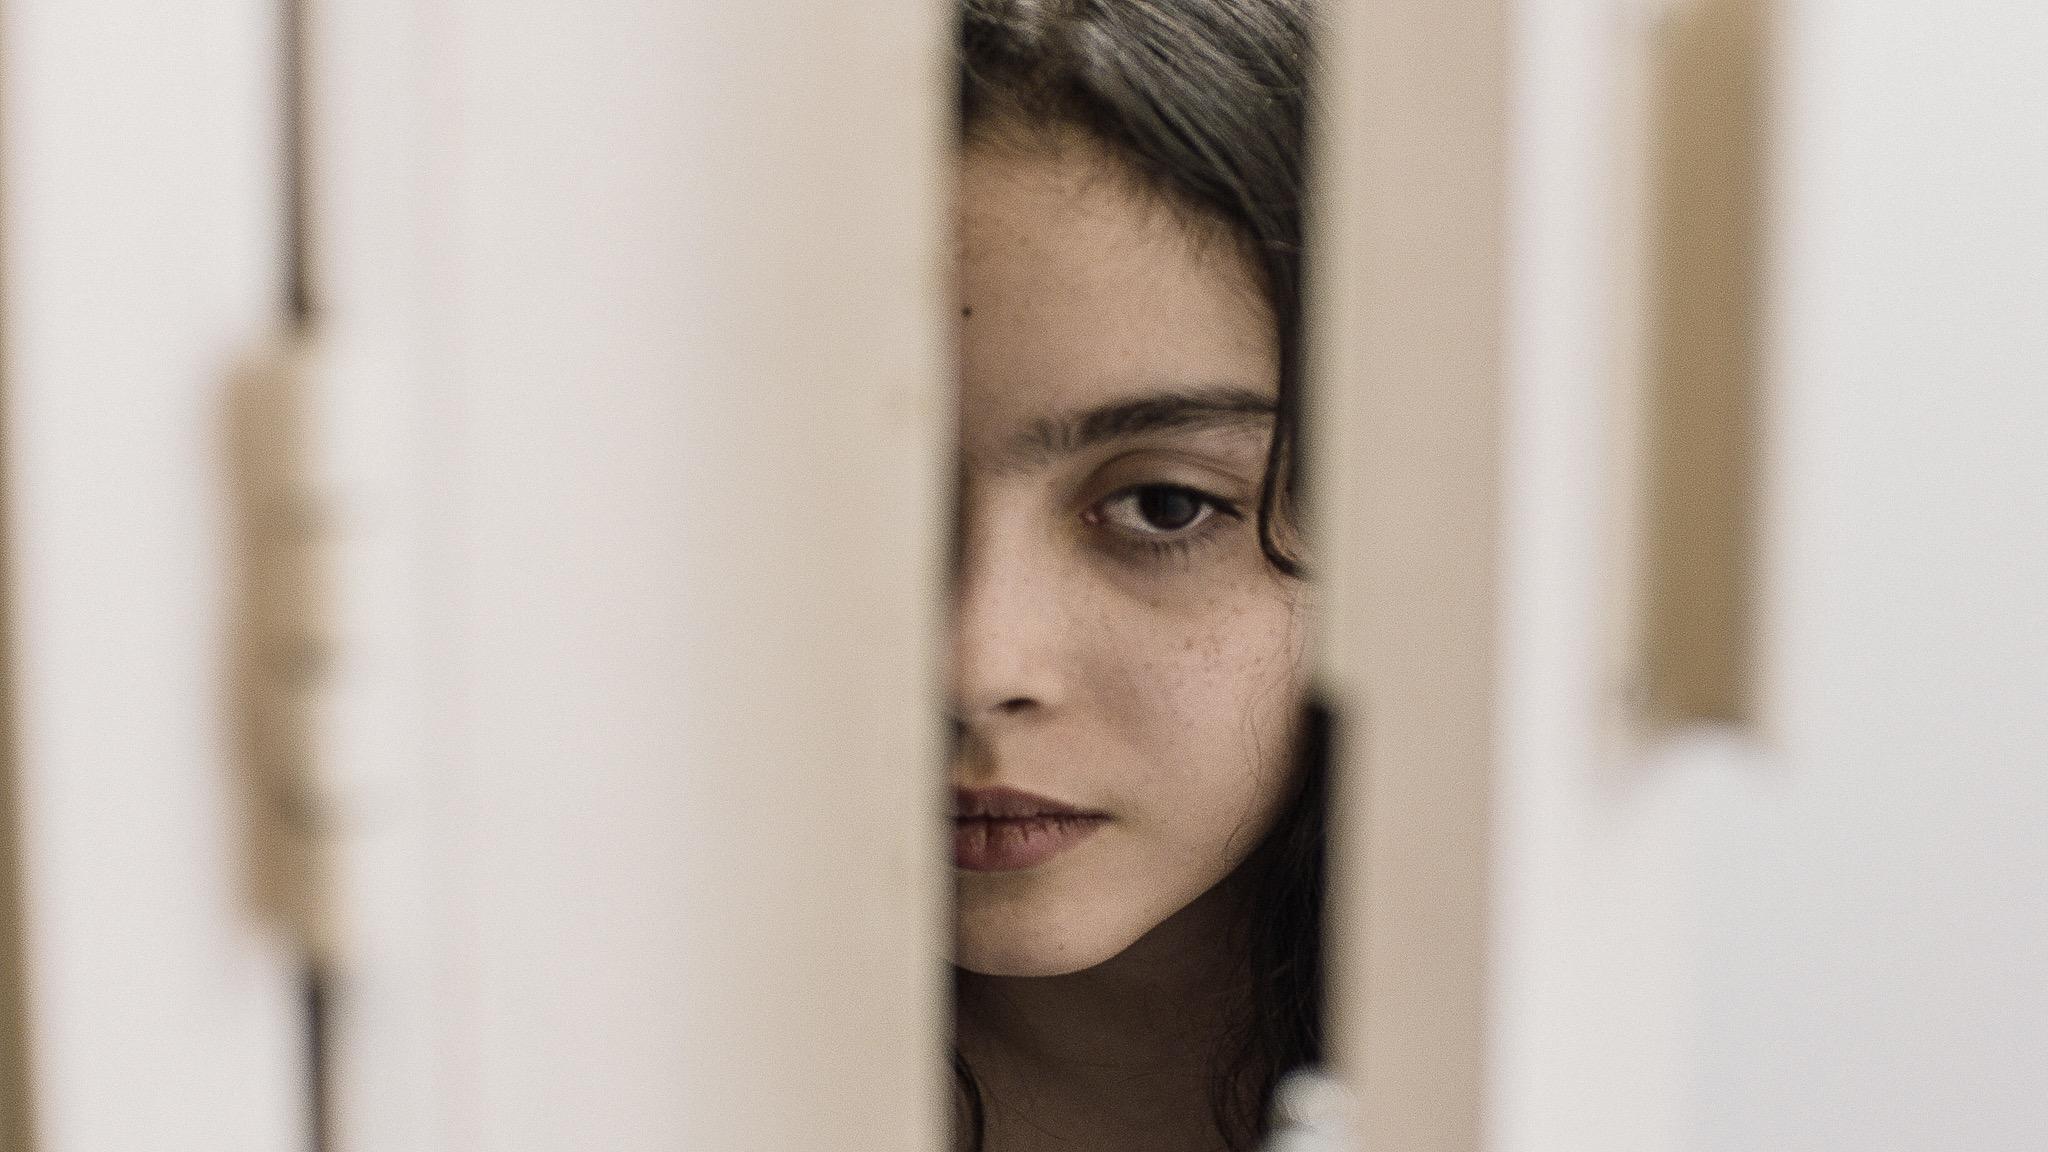 Somebody_s Daughter STILL 01 - Joan Vicente Durà.jpg